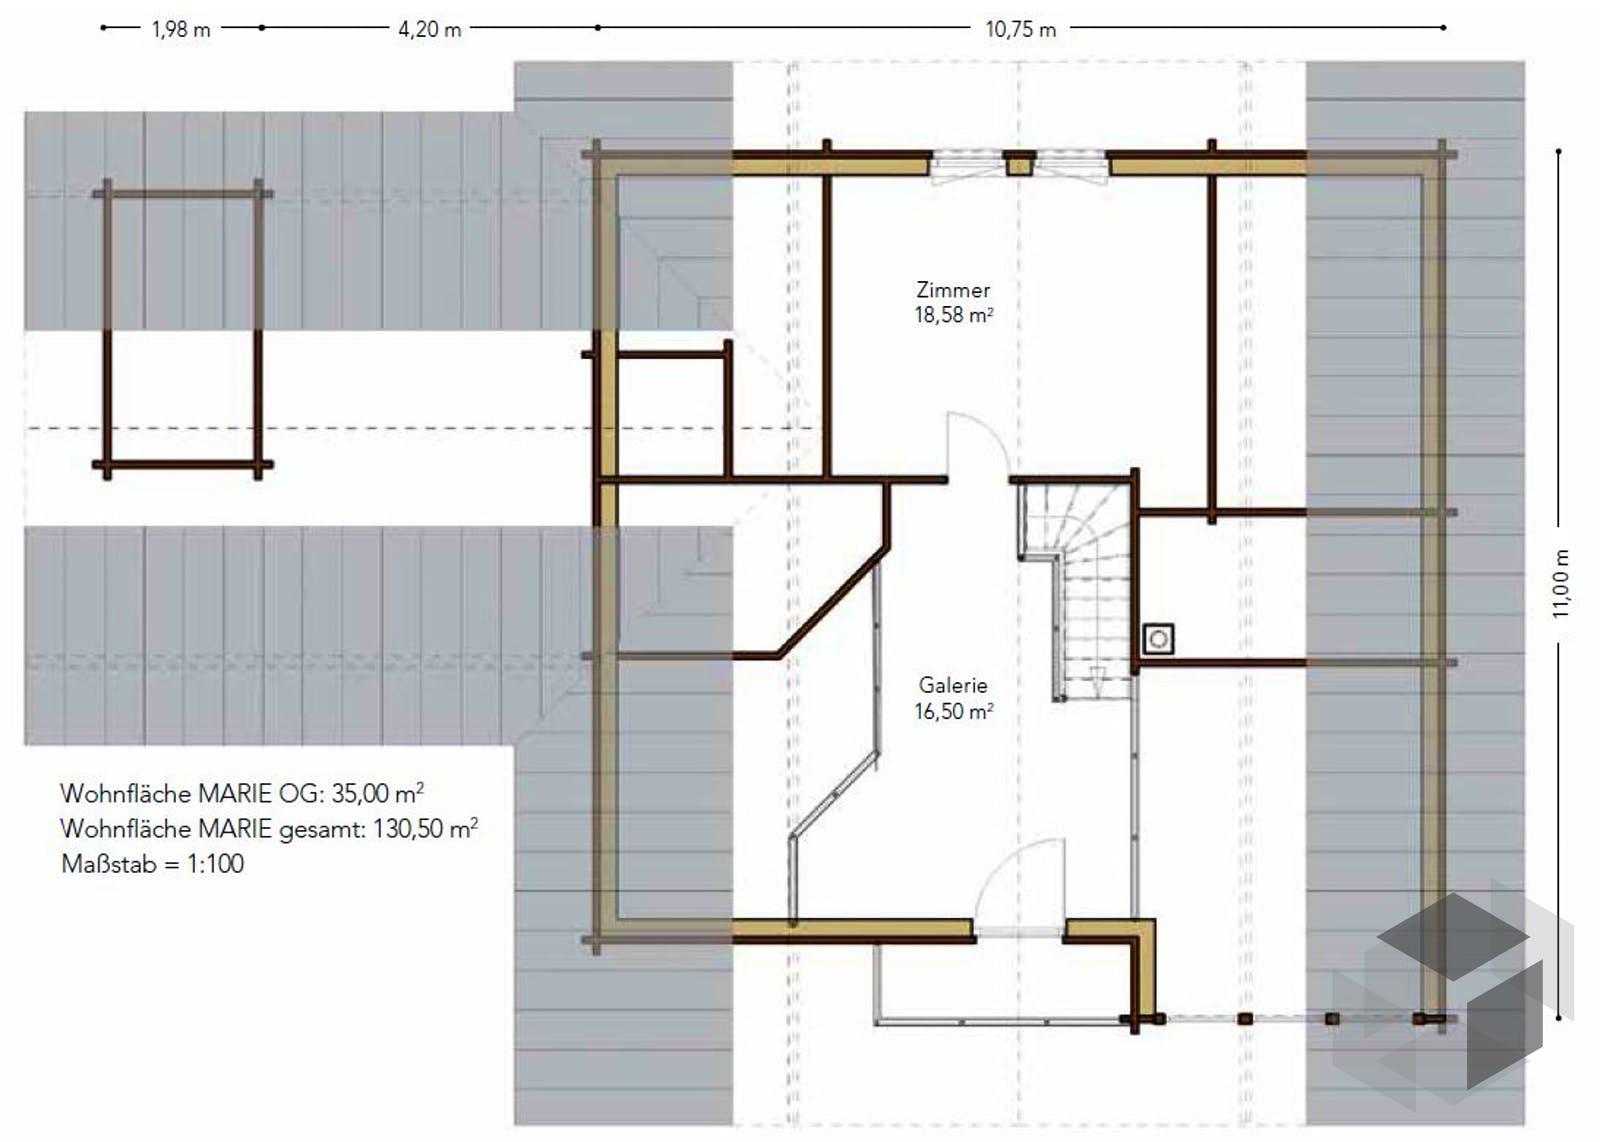 marie inactive von rubner haus komplette daten bersicht. Black Bedroom Furniture Sets. Home Design Ideas